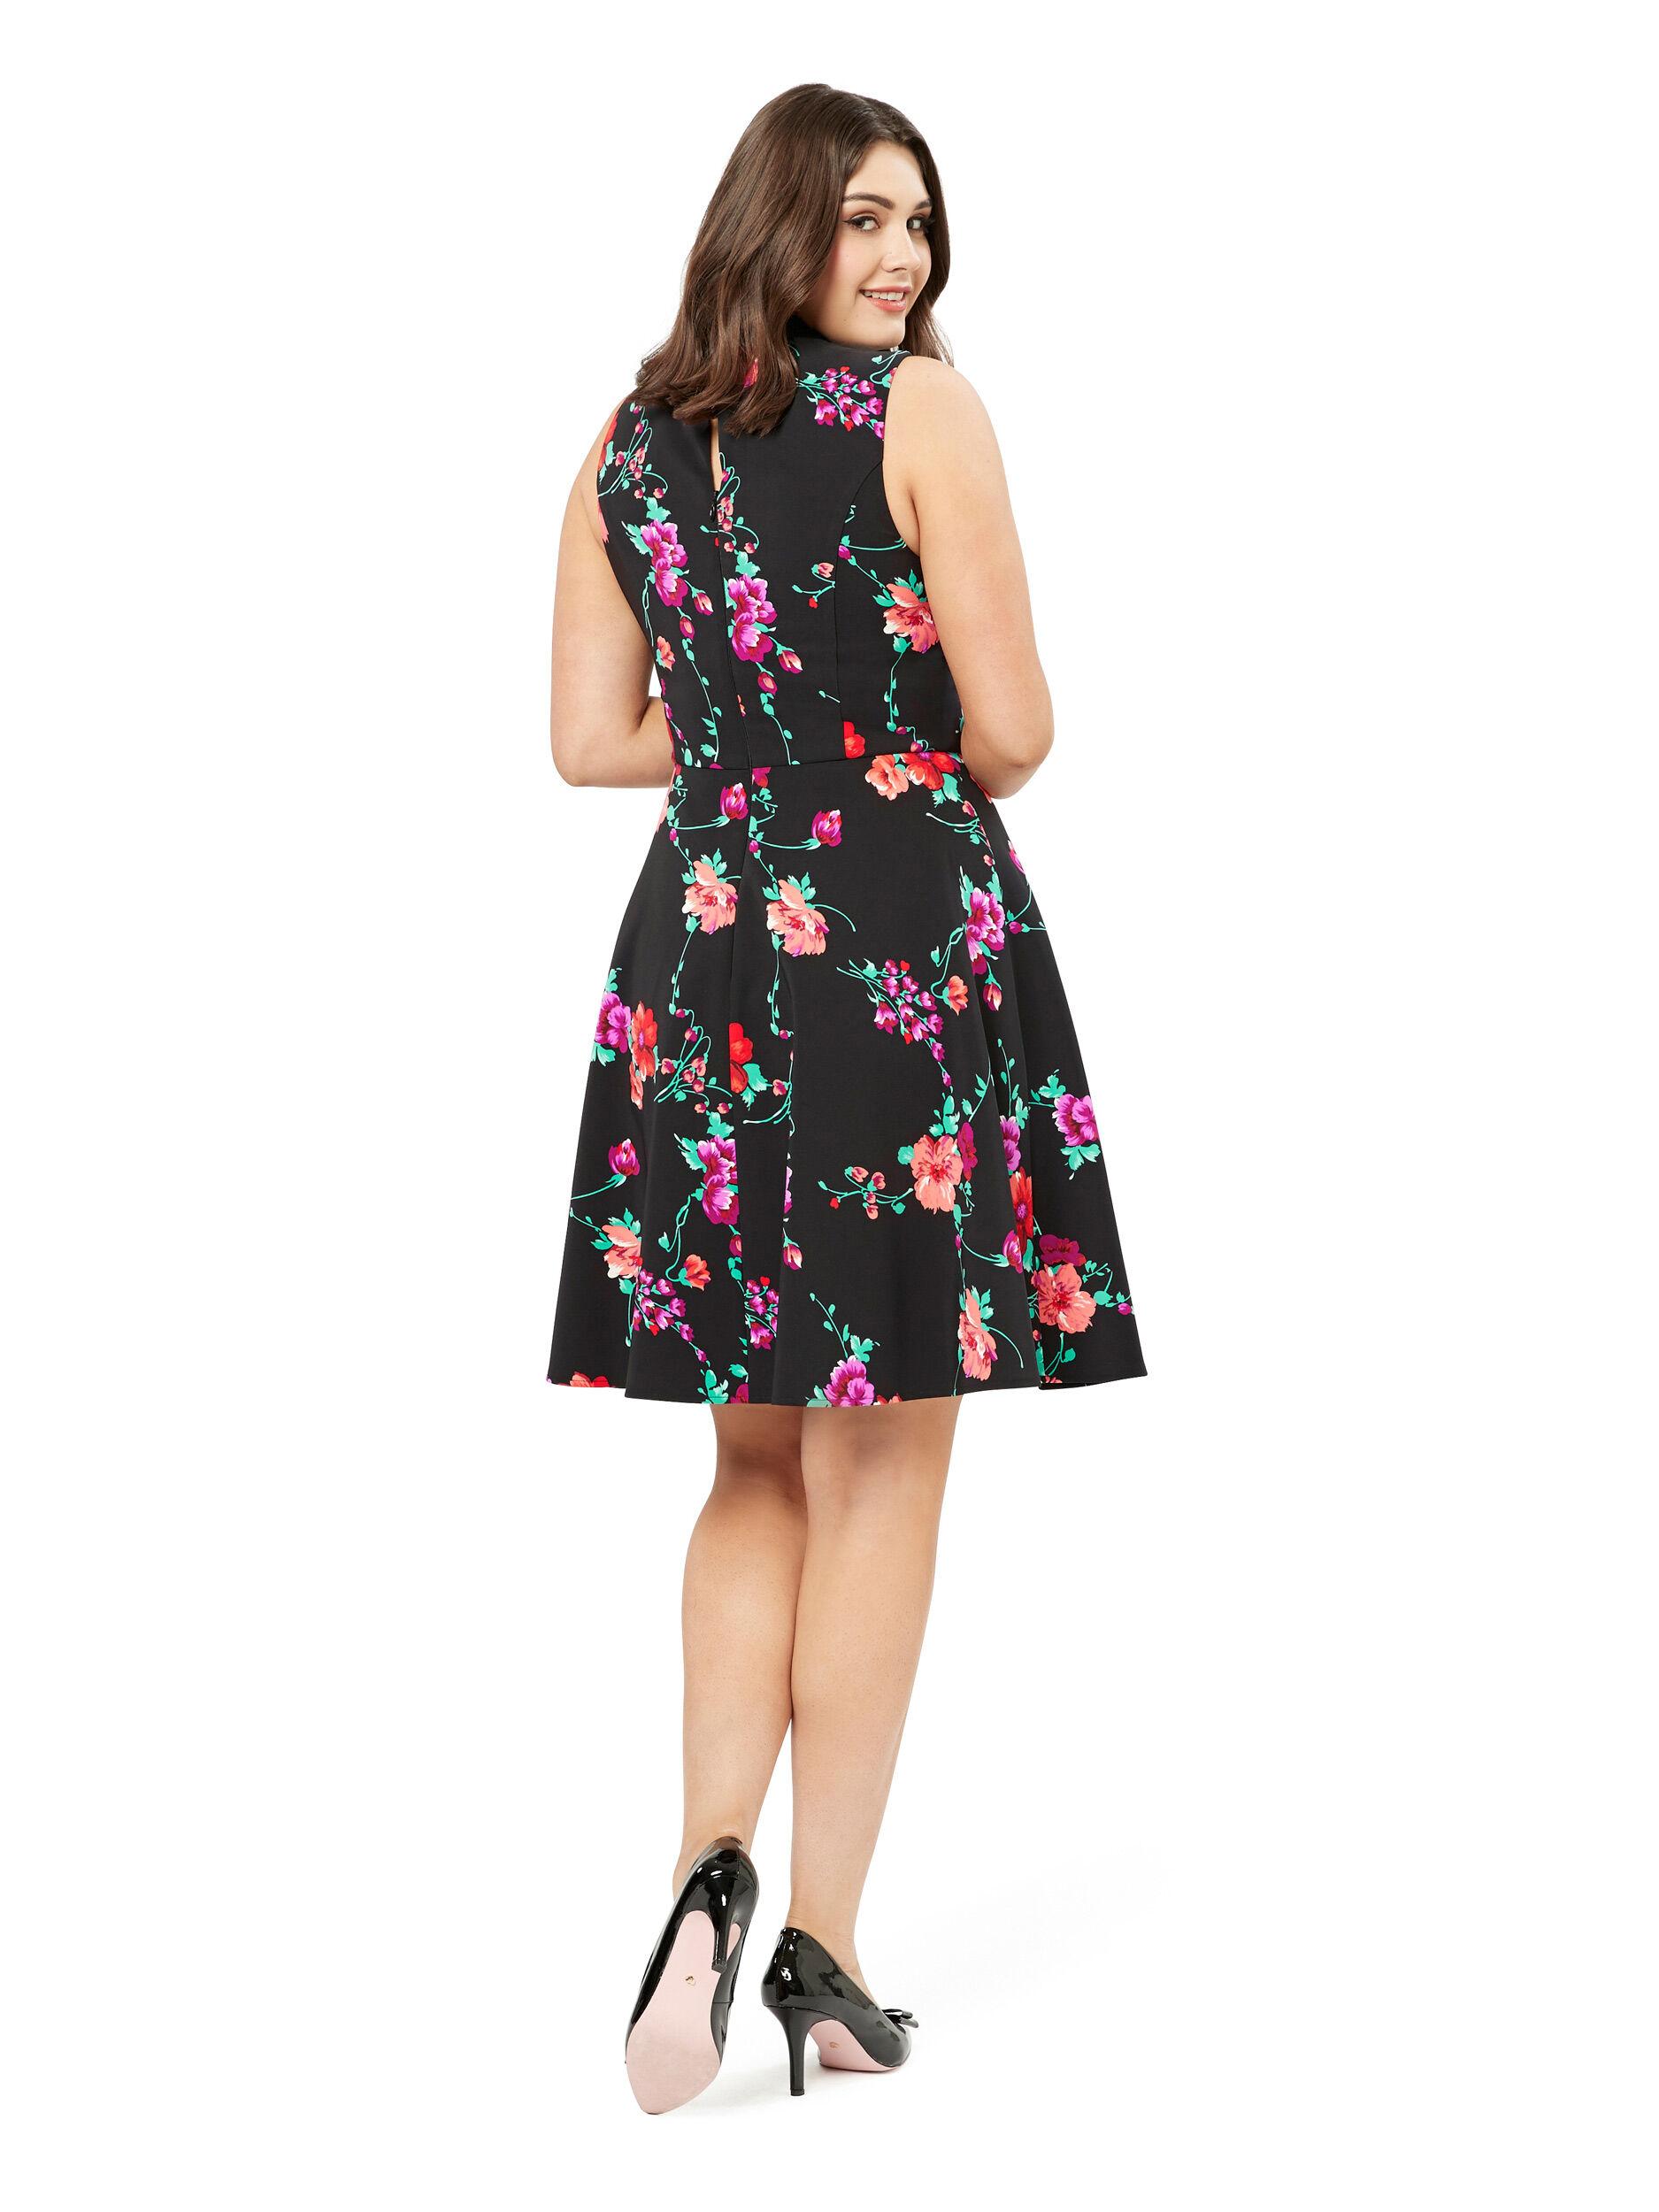 Hera Floral Dress